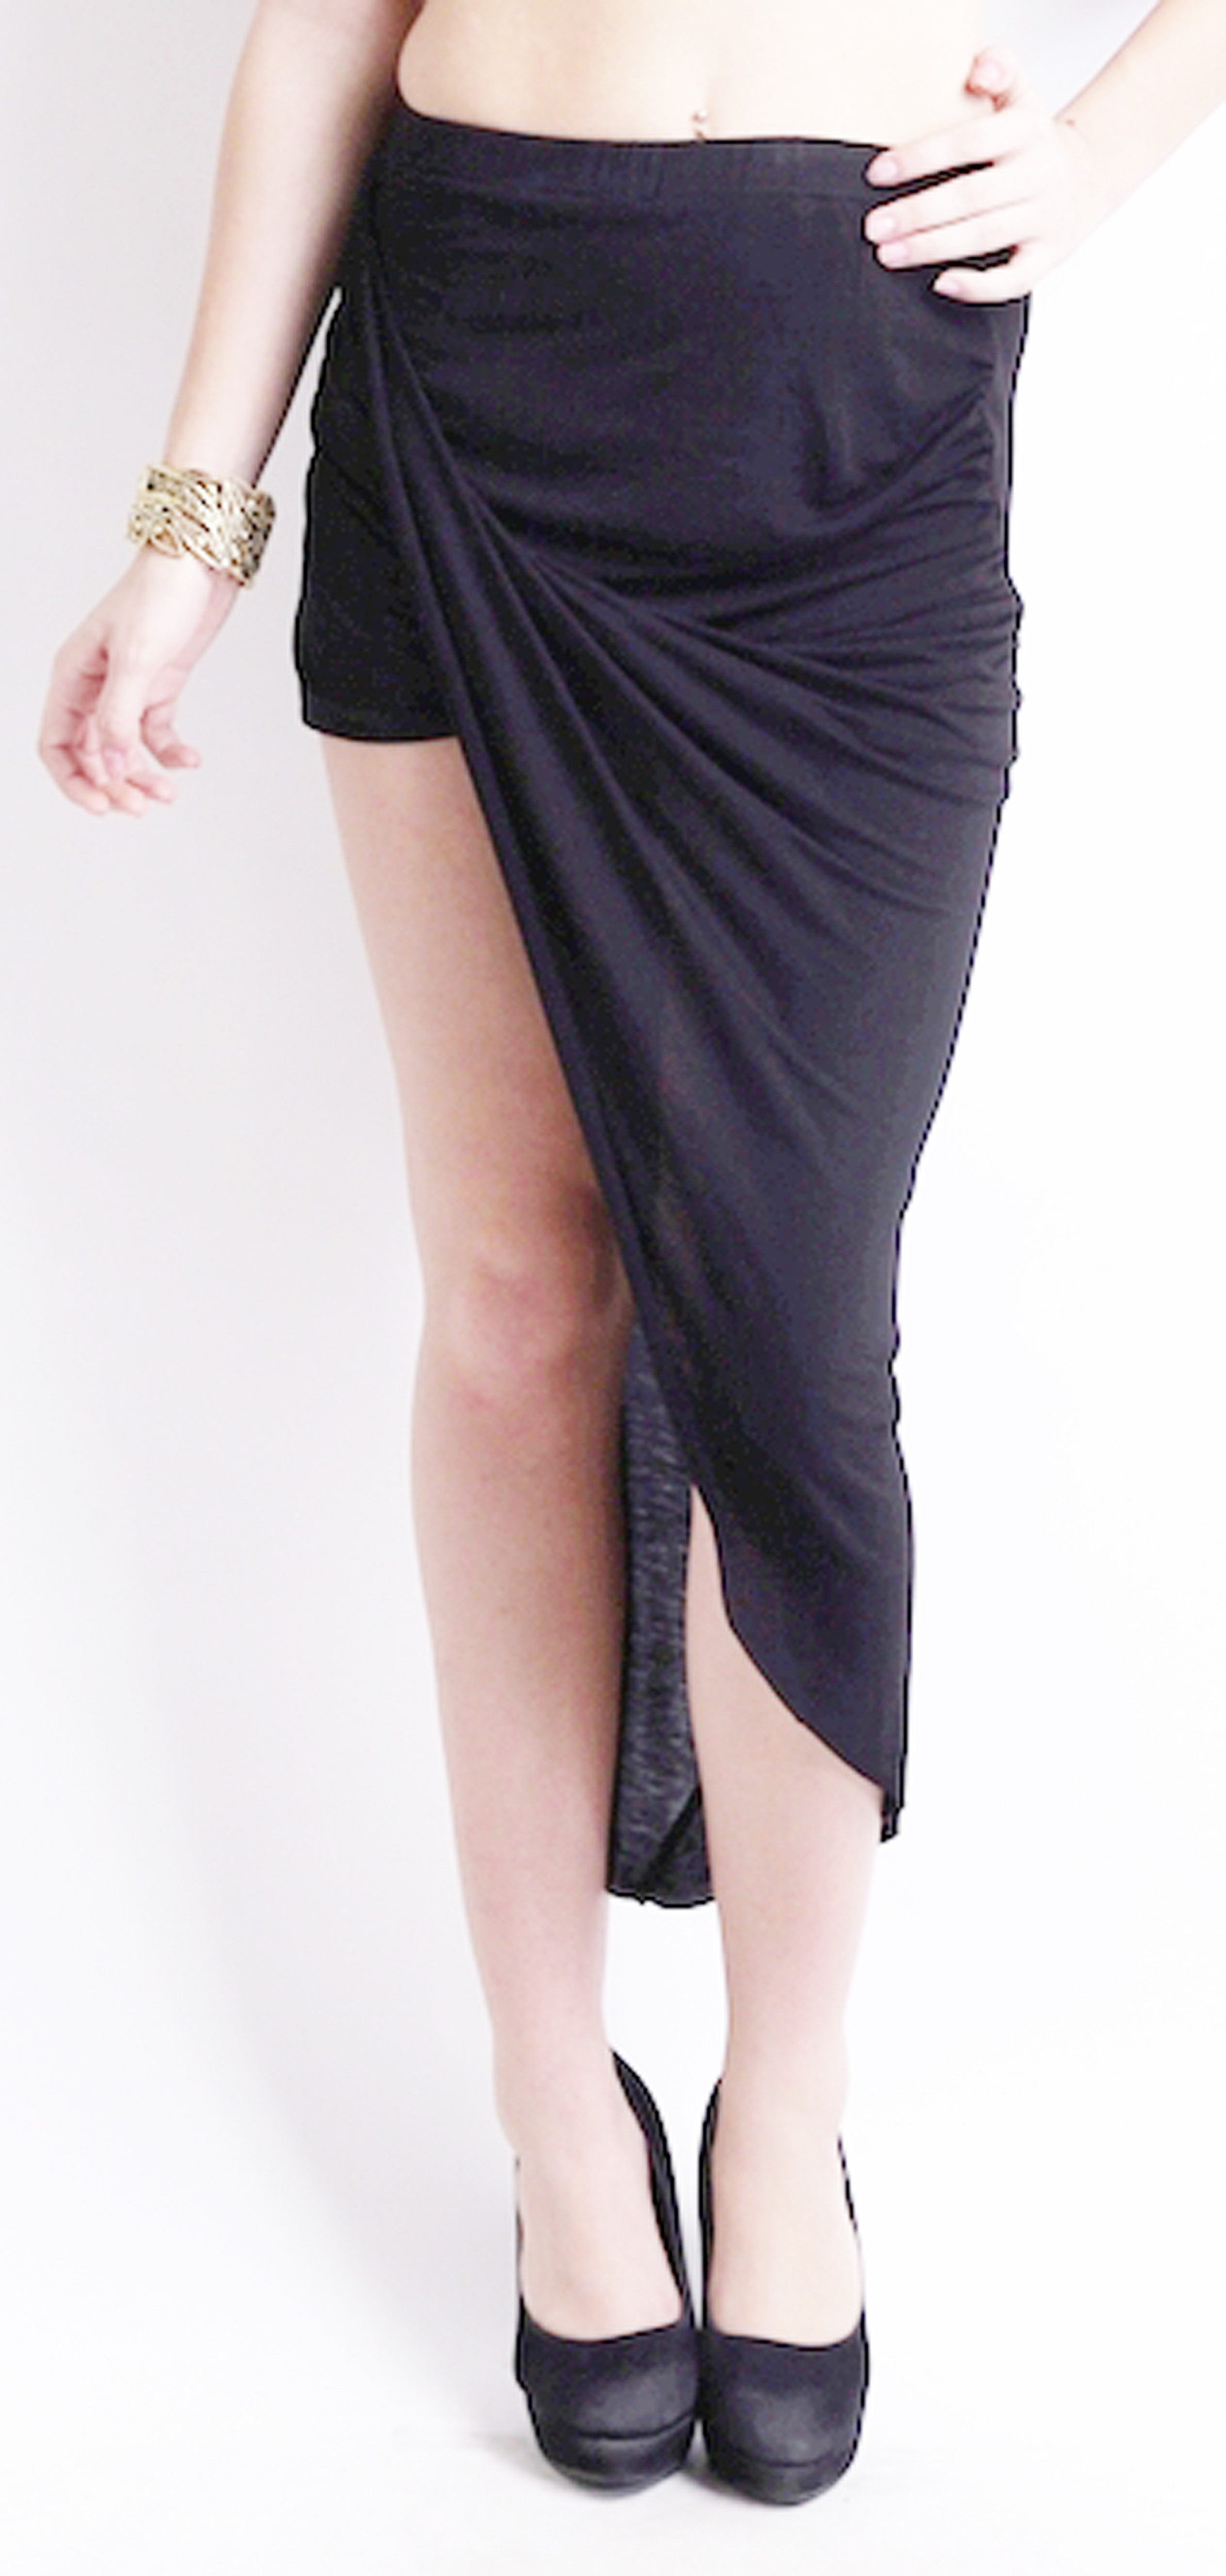 Ridress Solid Womens Wrap Around Black Skirt